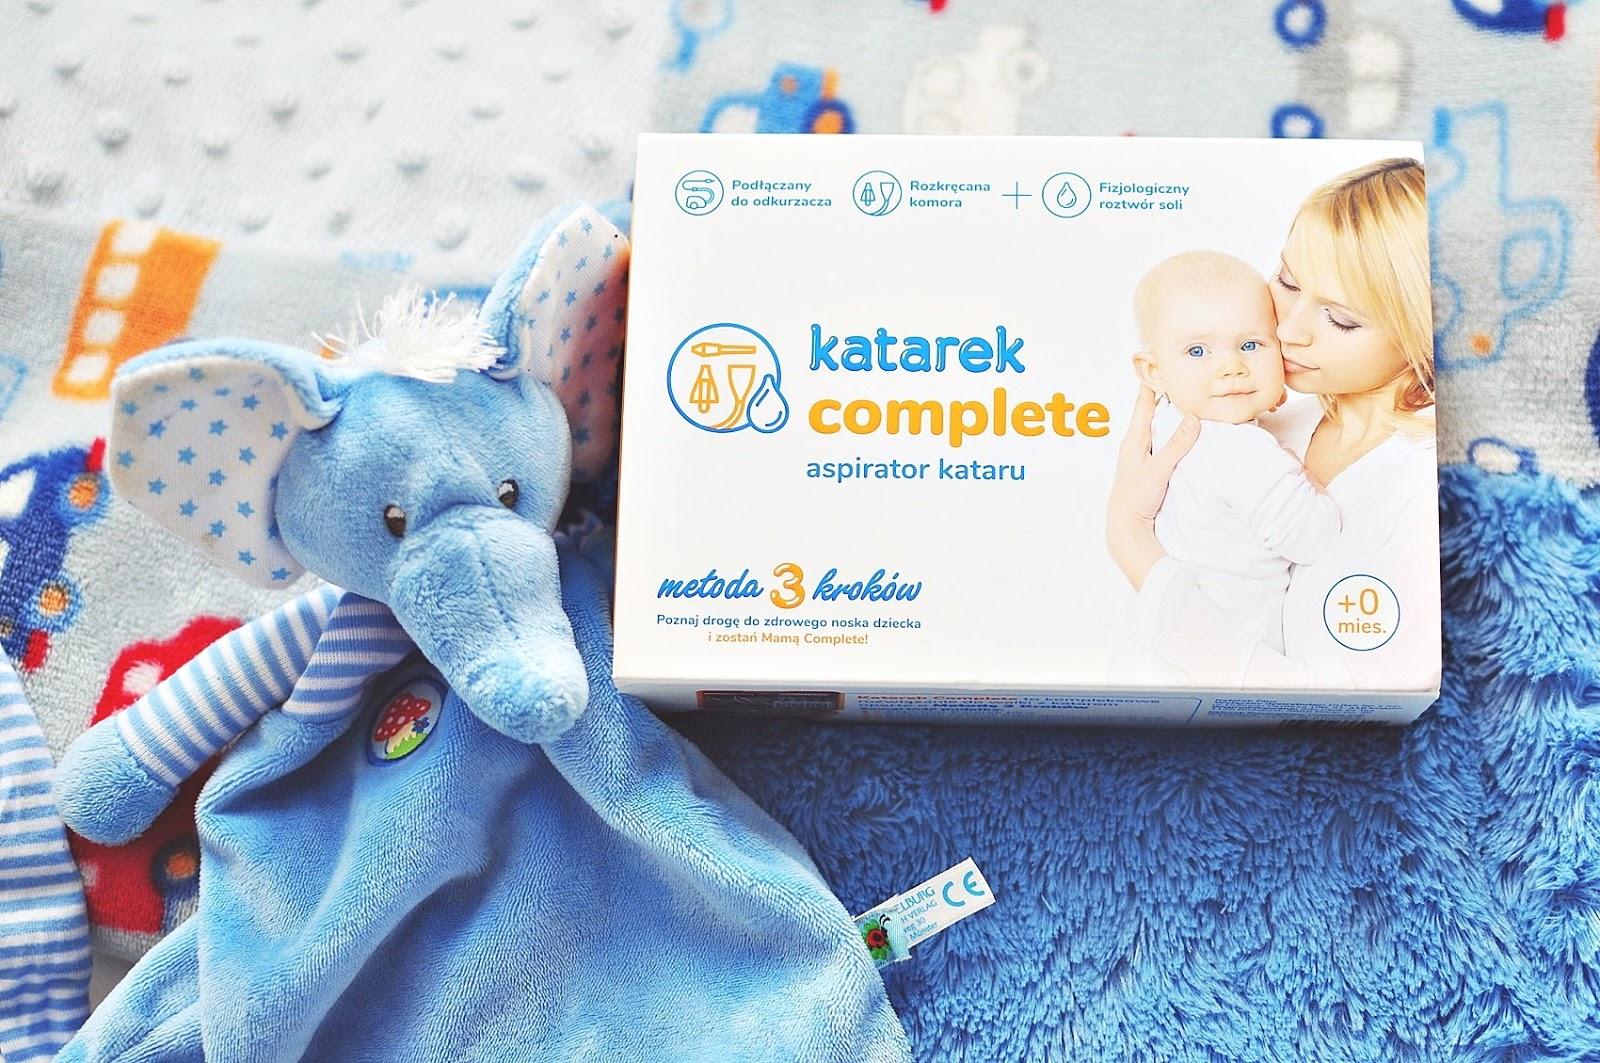 katarek-complete_opinia